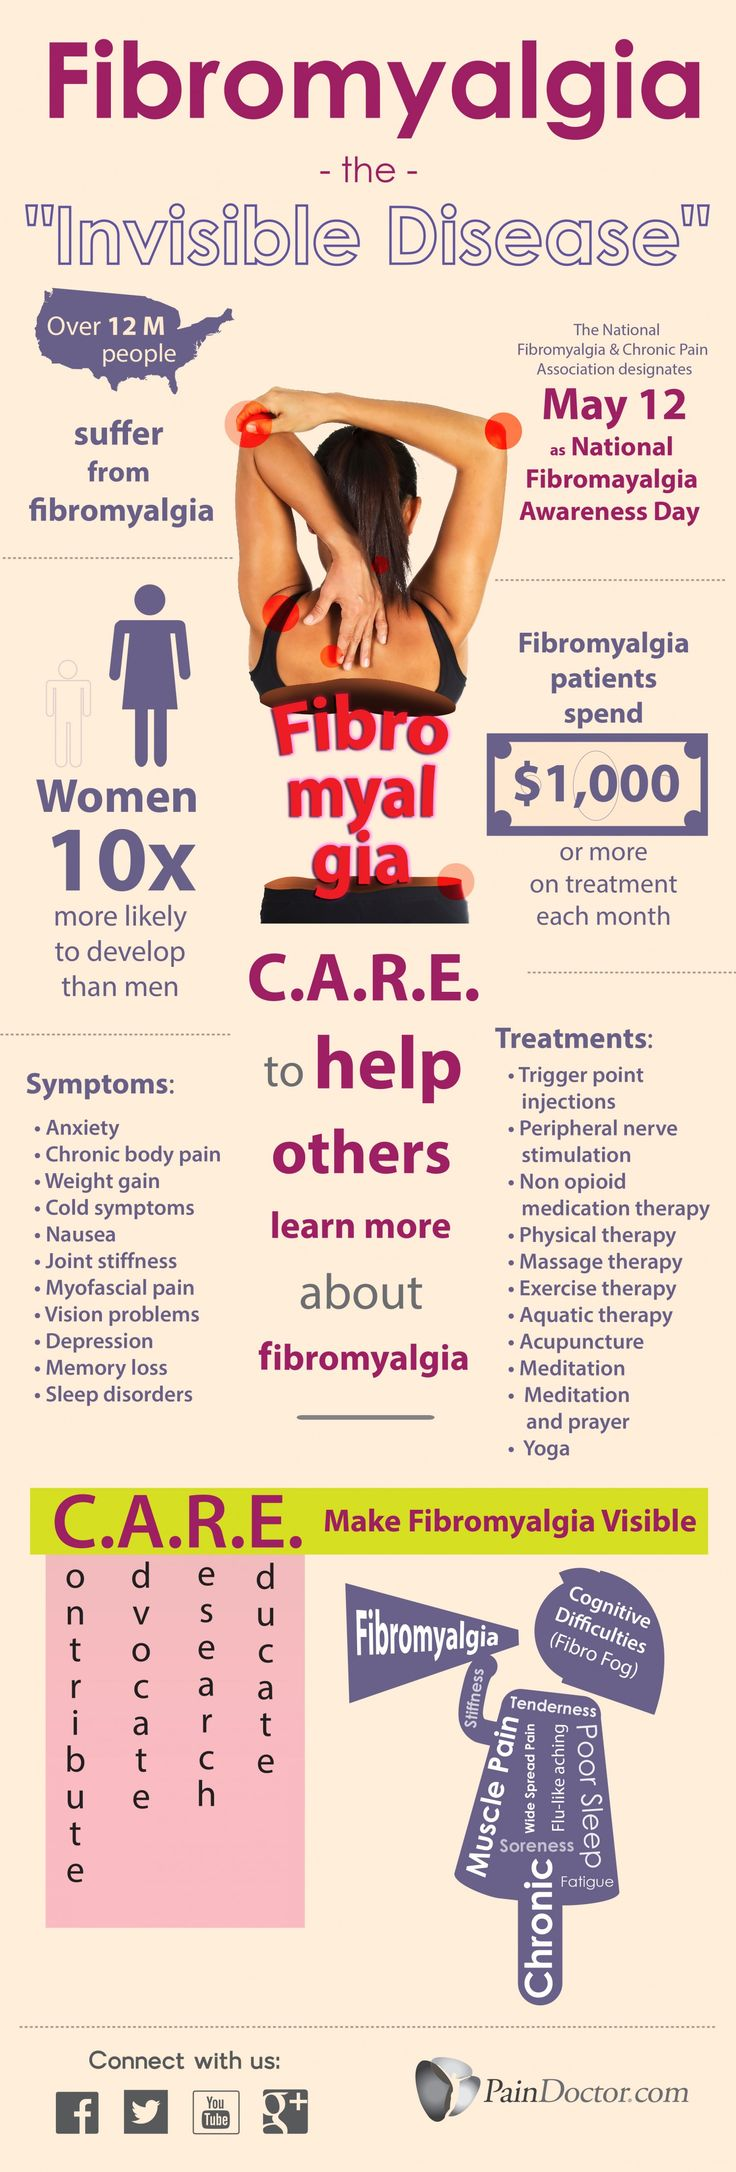 Fibromyalgia - The Invisible Disease Infographic